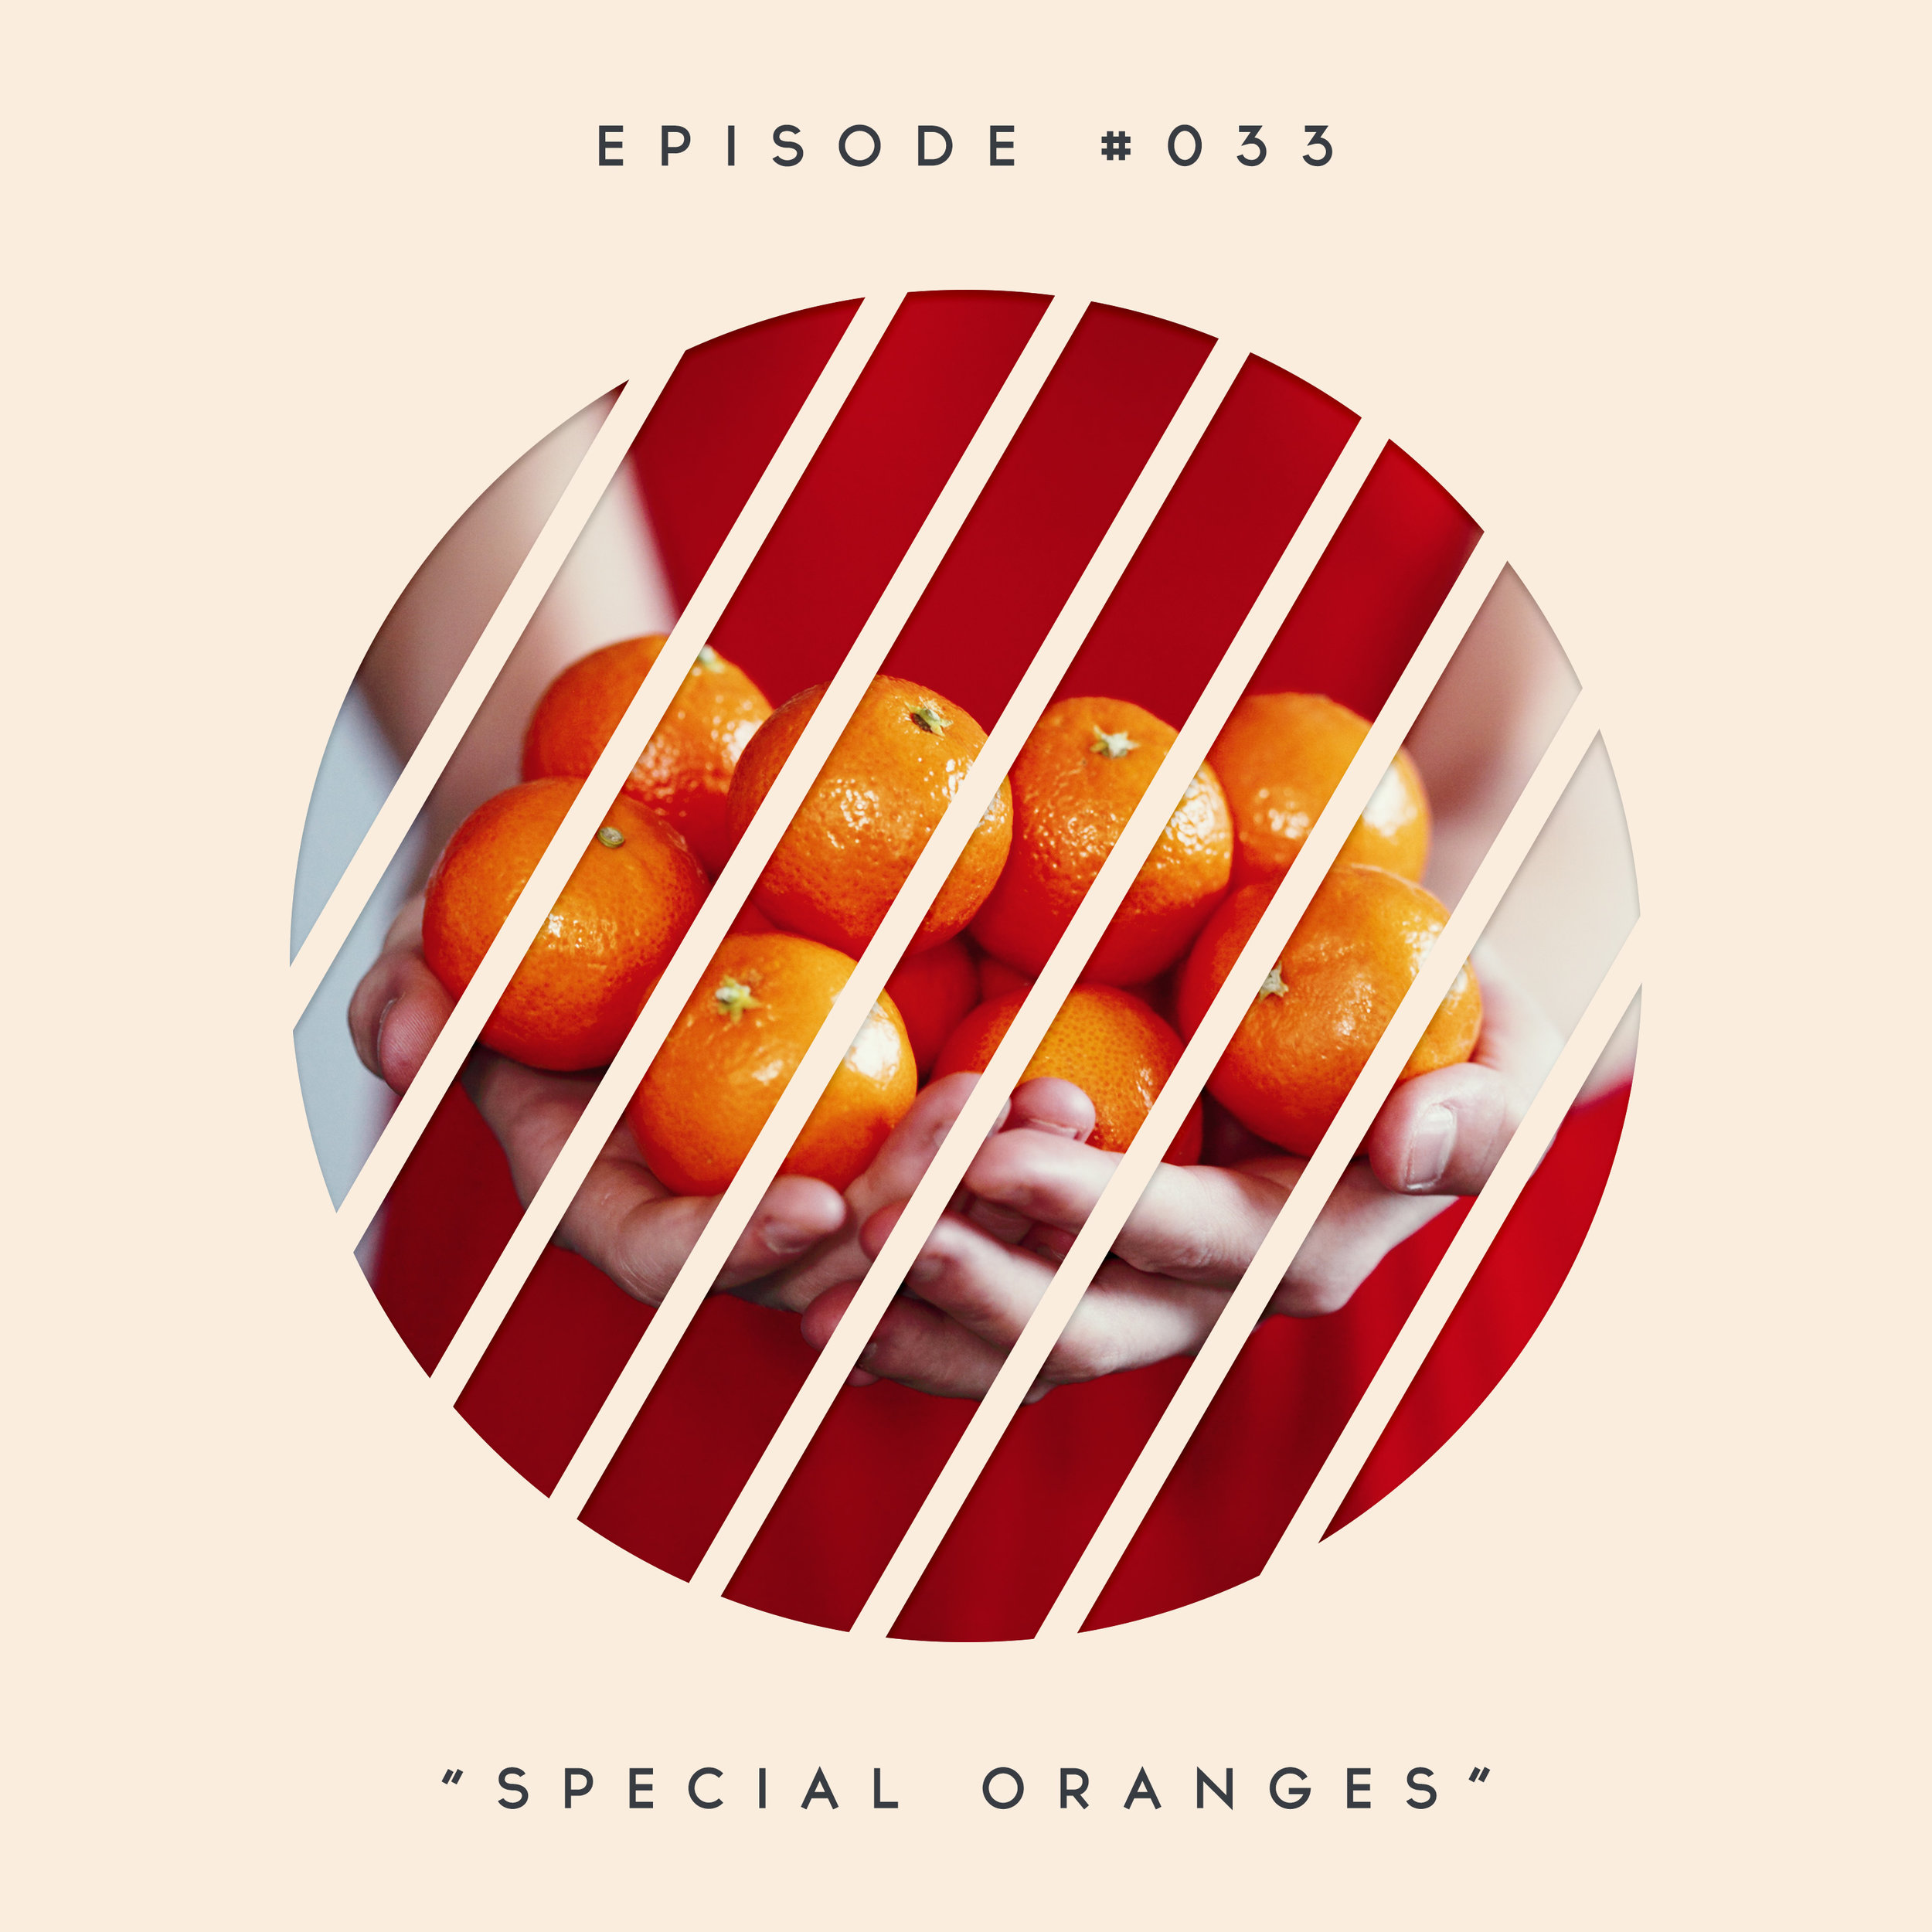 Special-Oranges.jpg